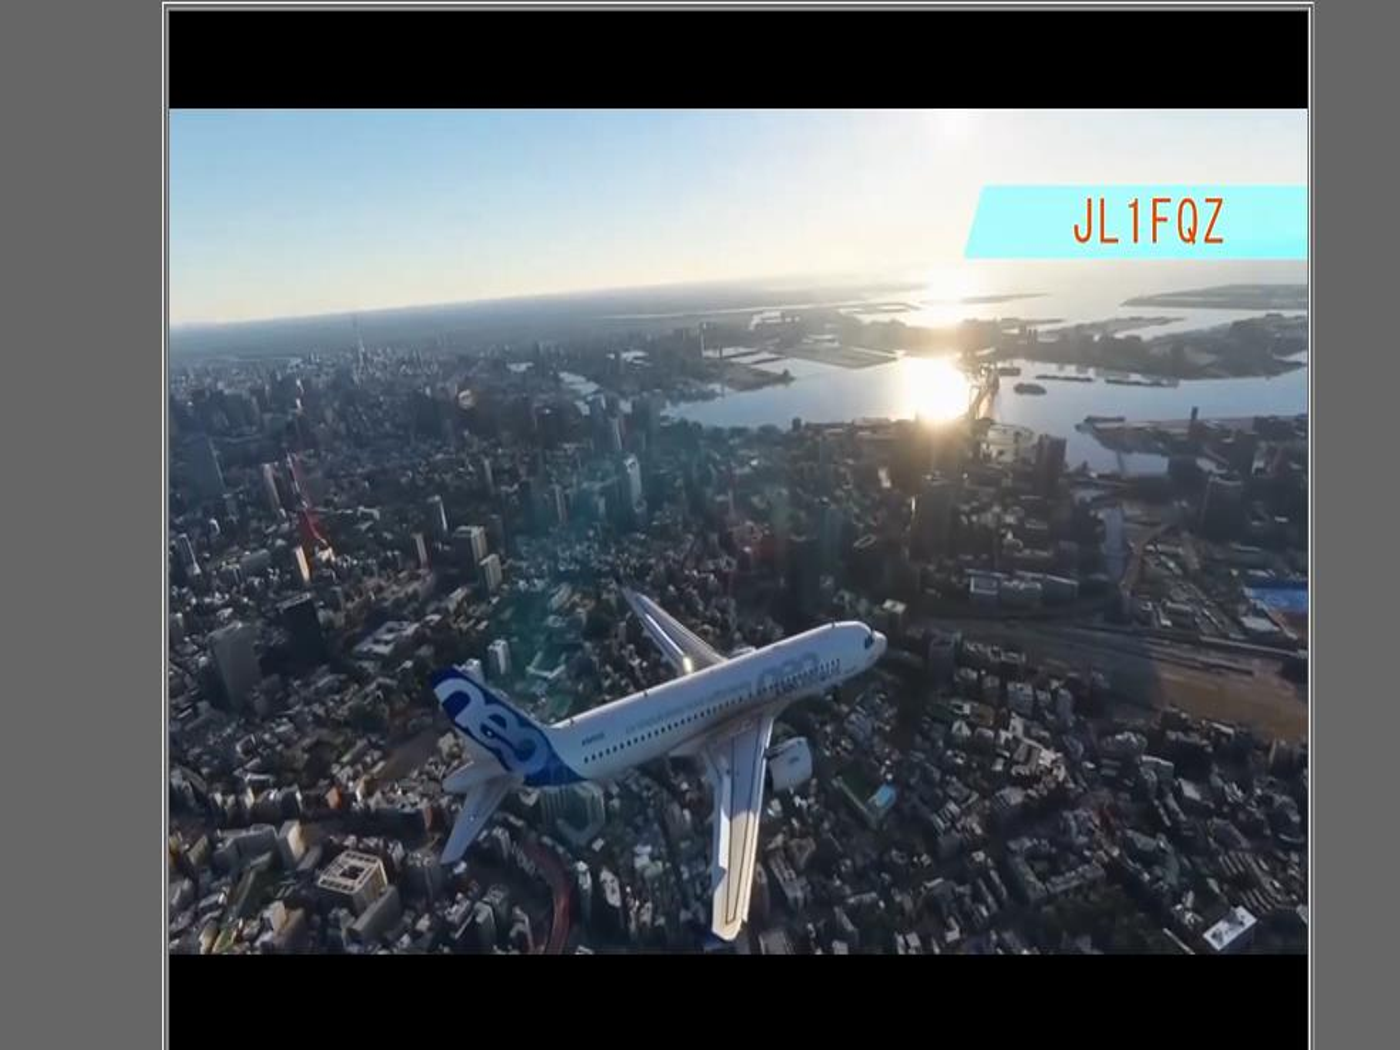 JH6NXX/